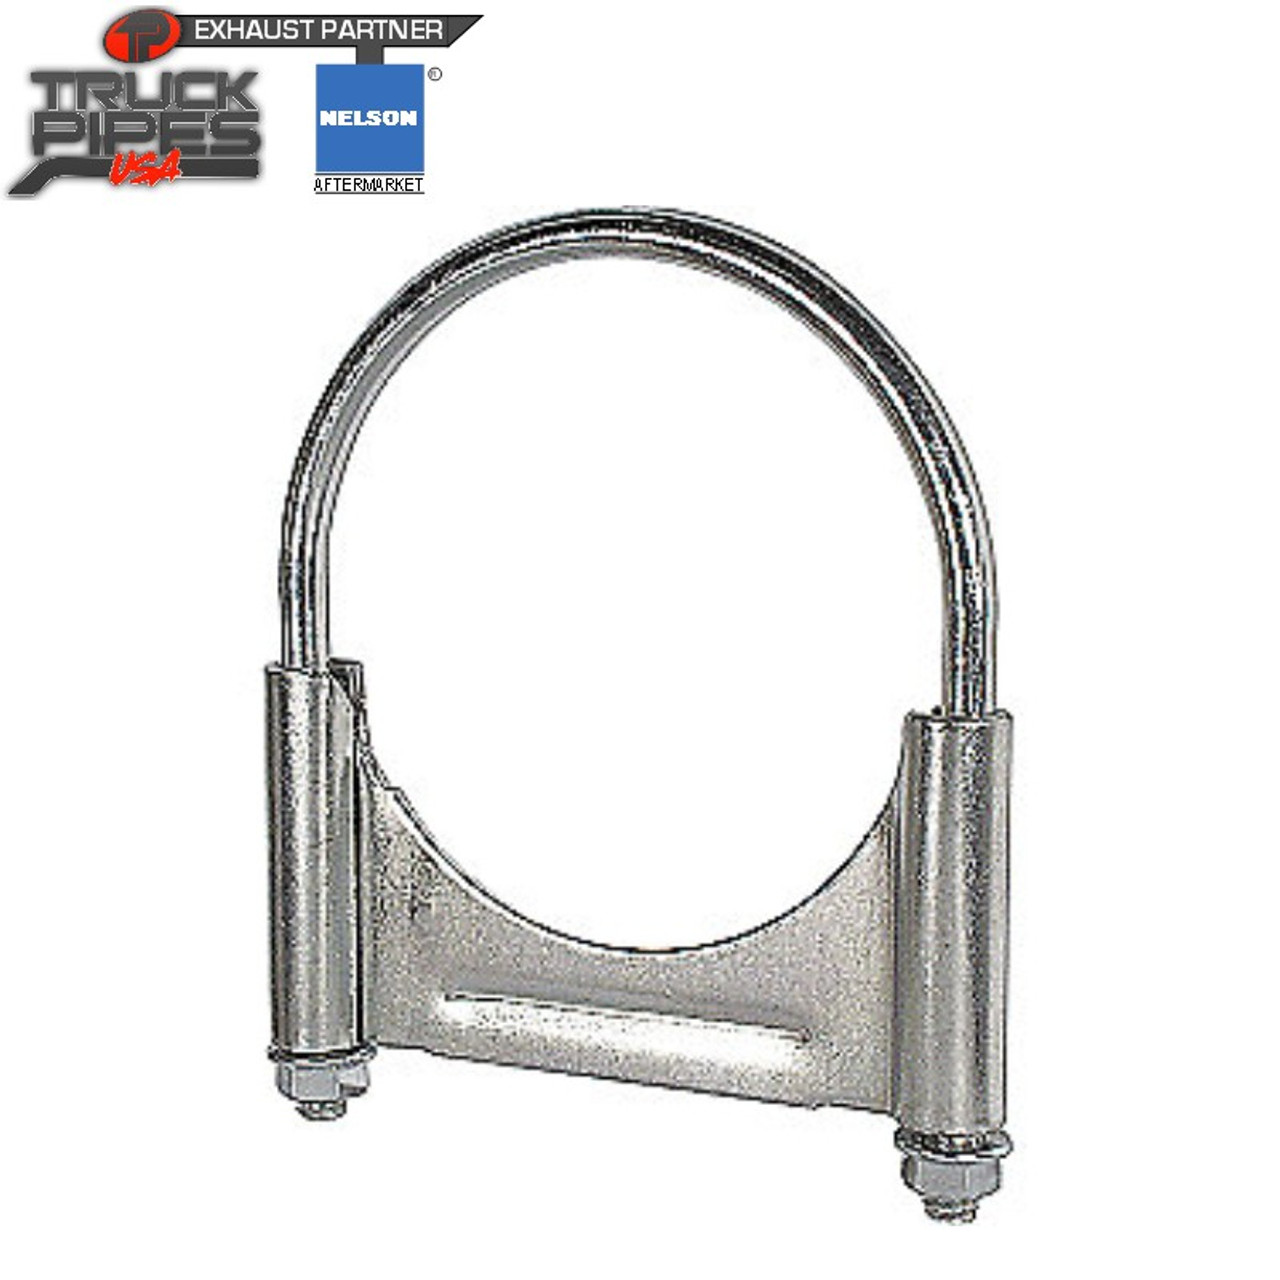 2 5 zinc plated u bolt guillotine exhaust clamp 89543k